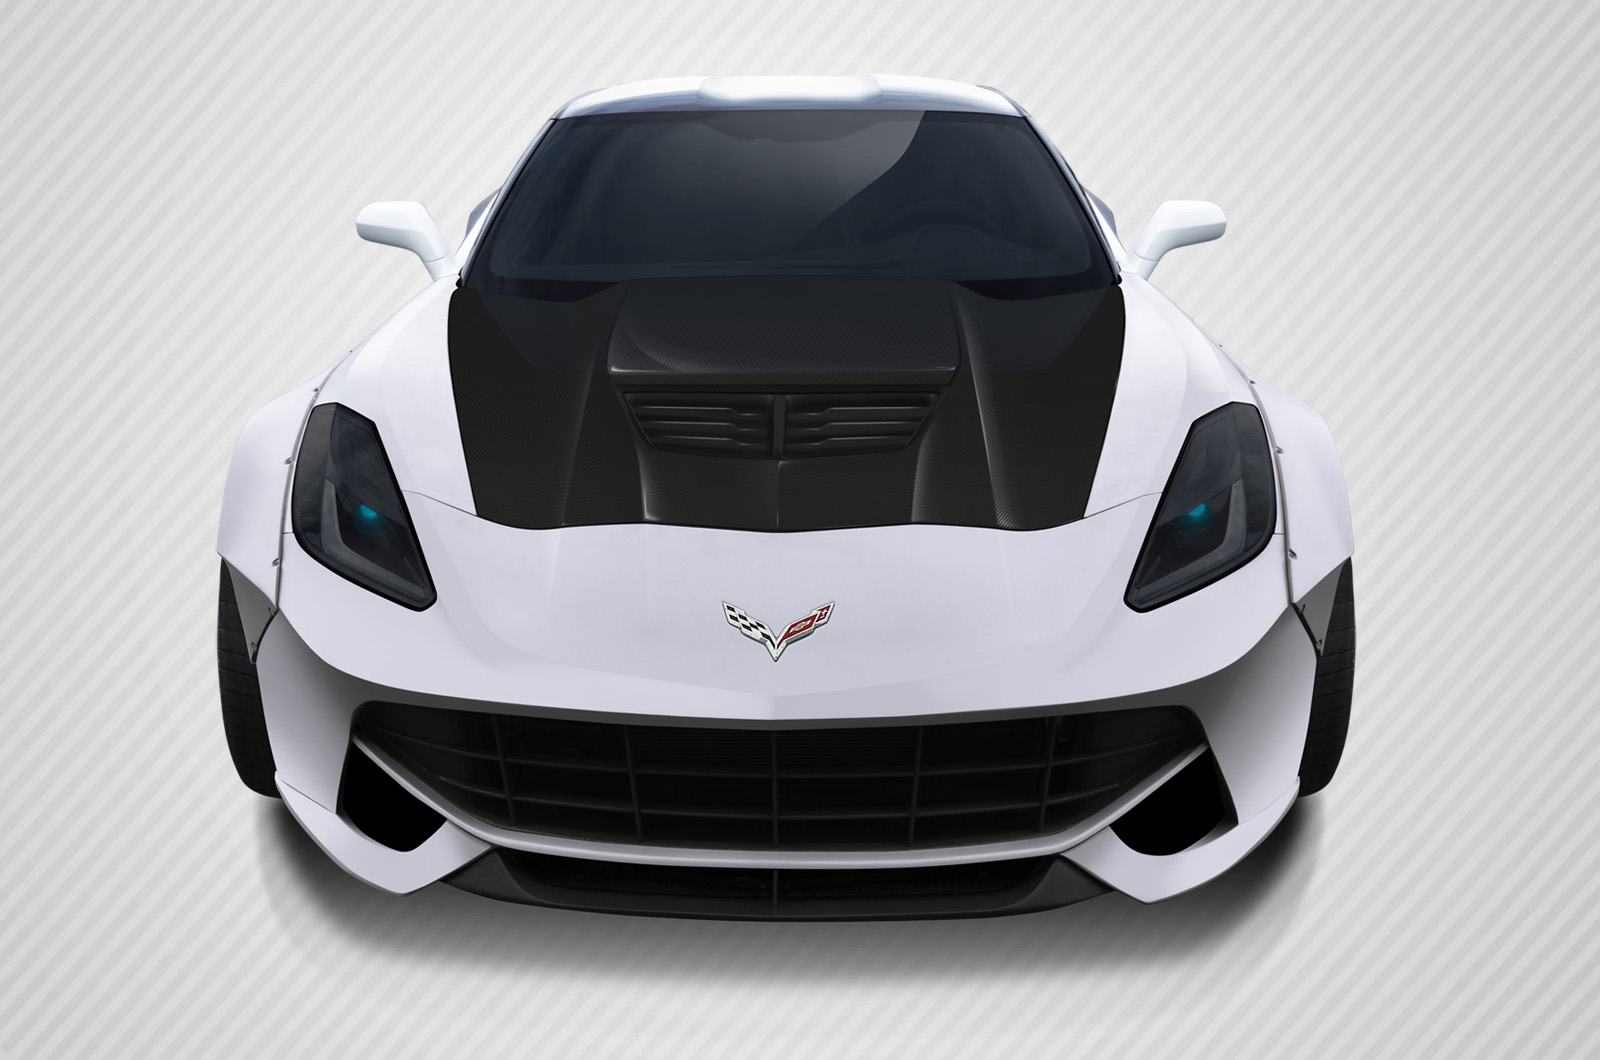 2016 Chevrolet Corvette ALL Hood Bodykit - Chevrolet Corvette Carbon Creations Z06 Look Hood- 1 Piece